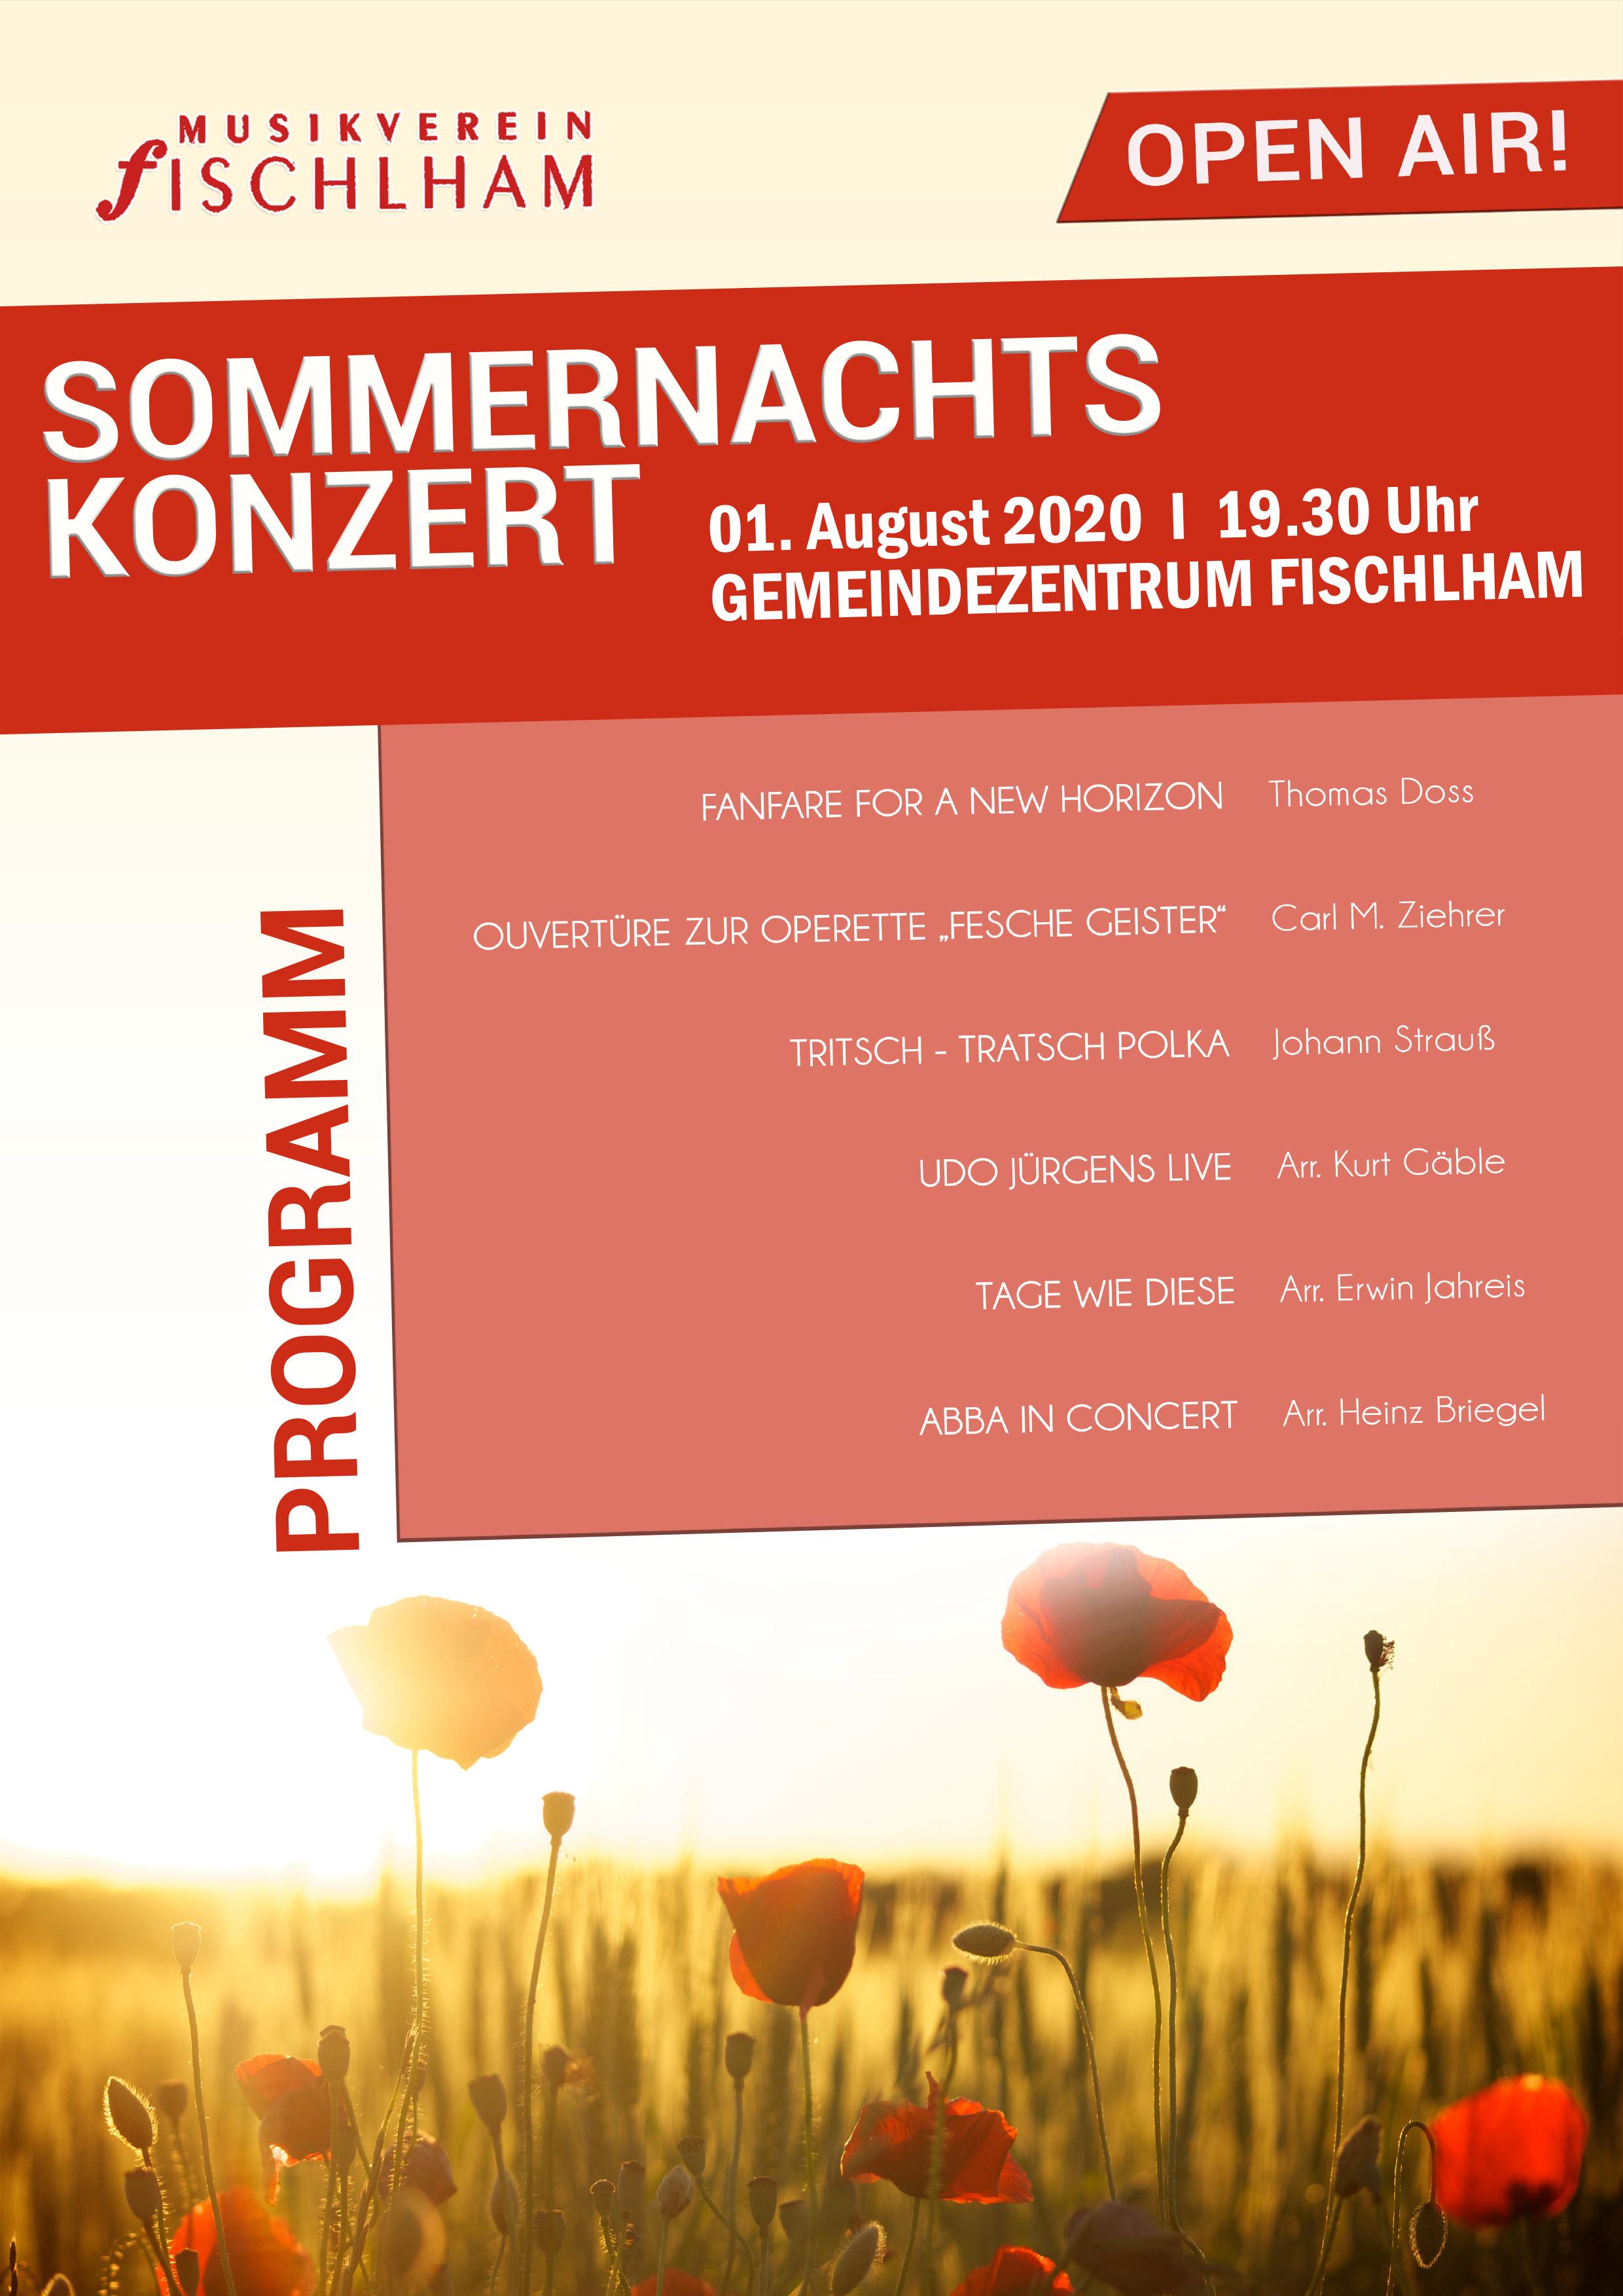 poster_sommernachtskonzert_2020.psd